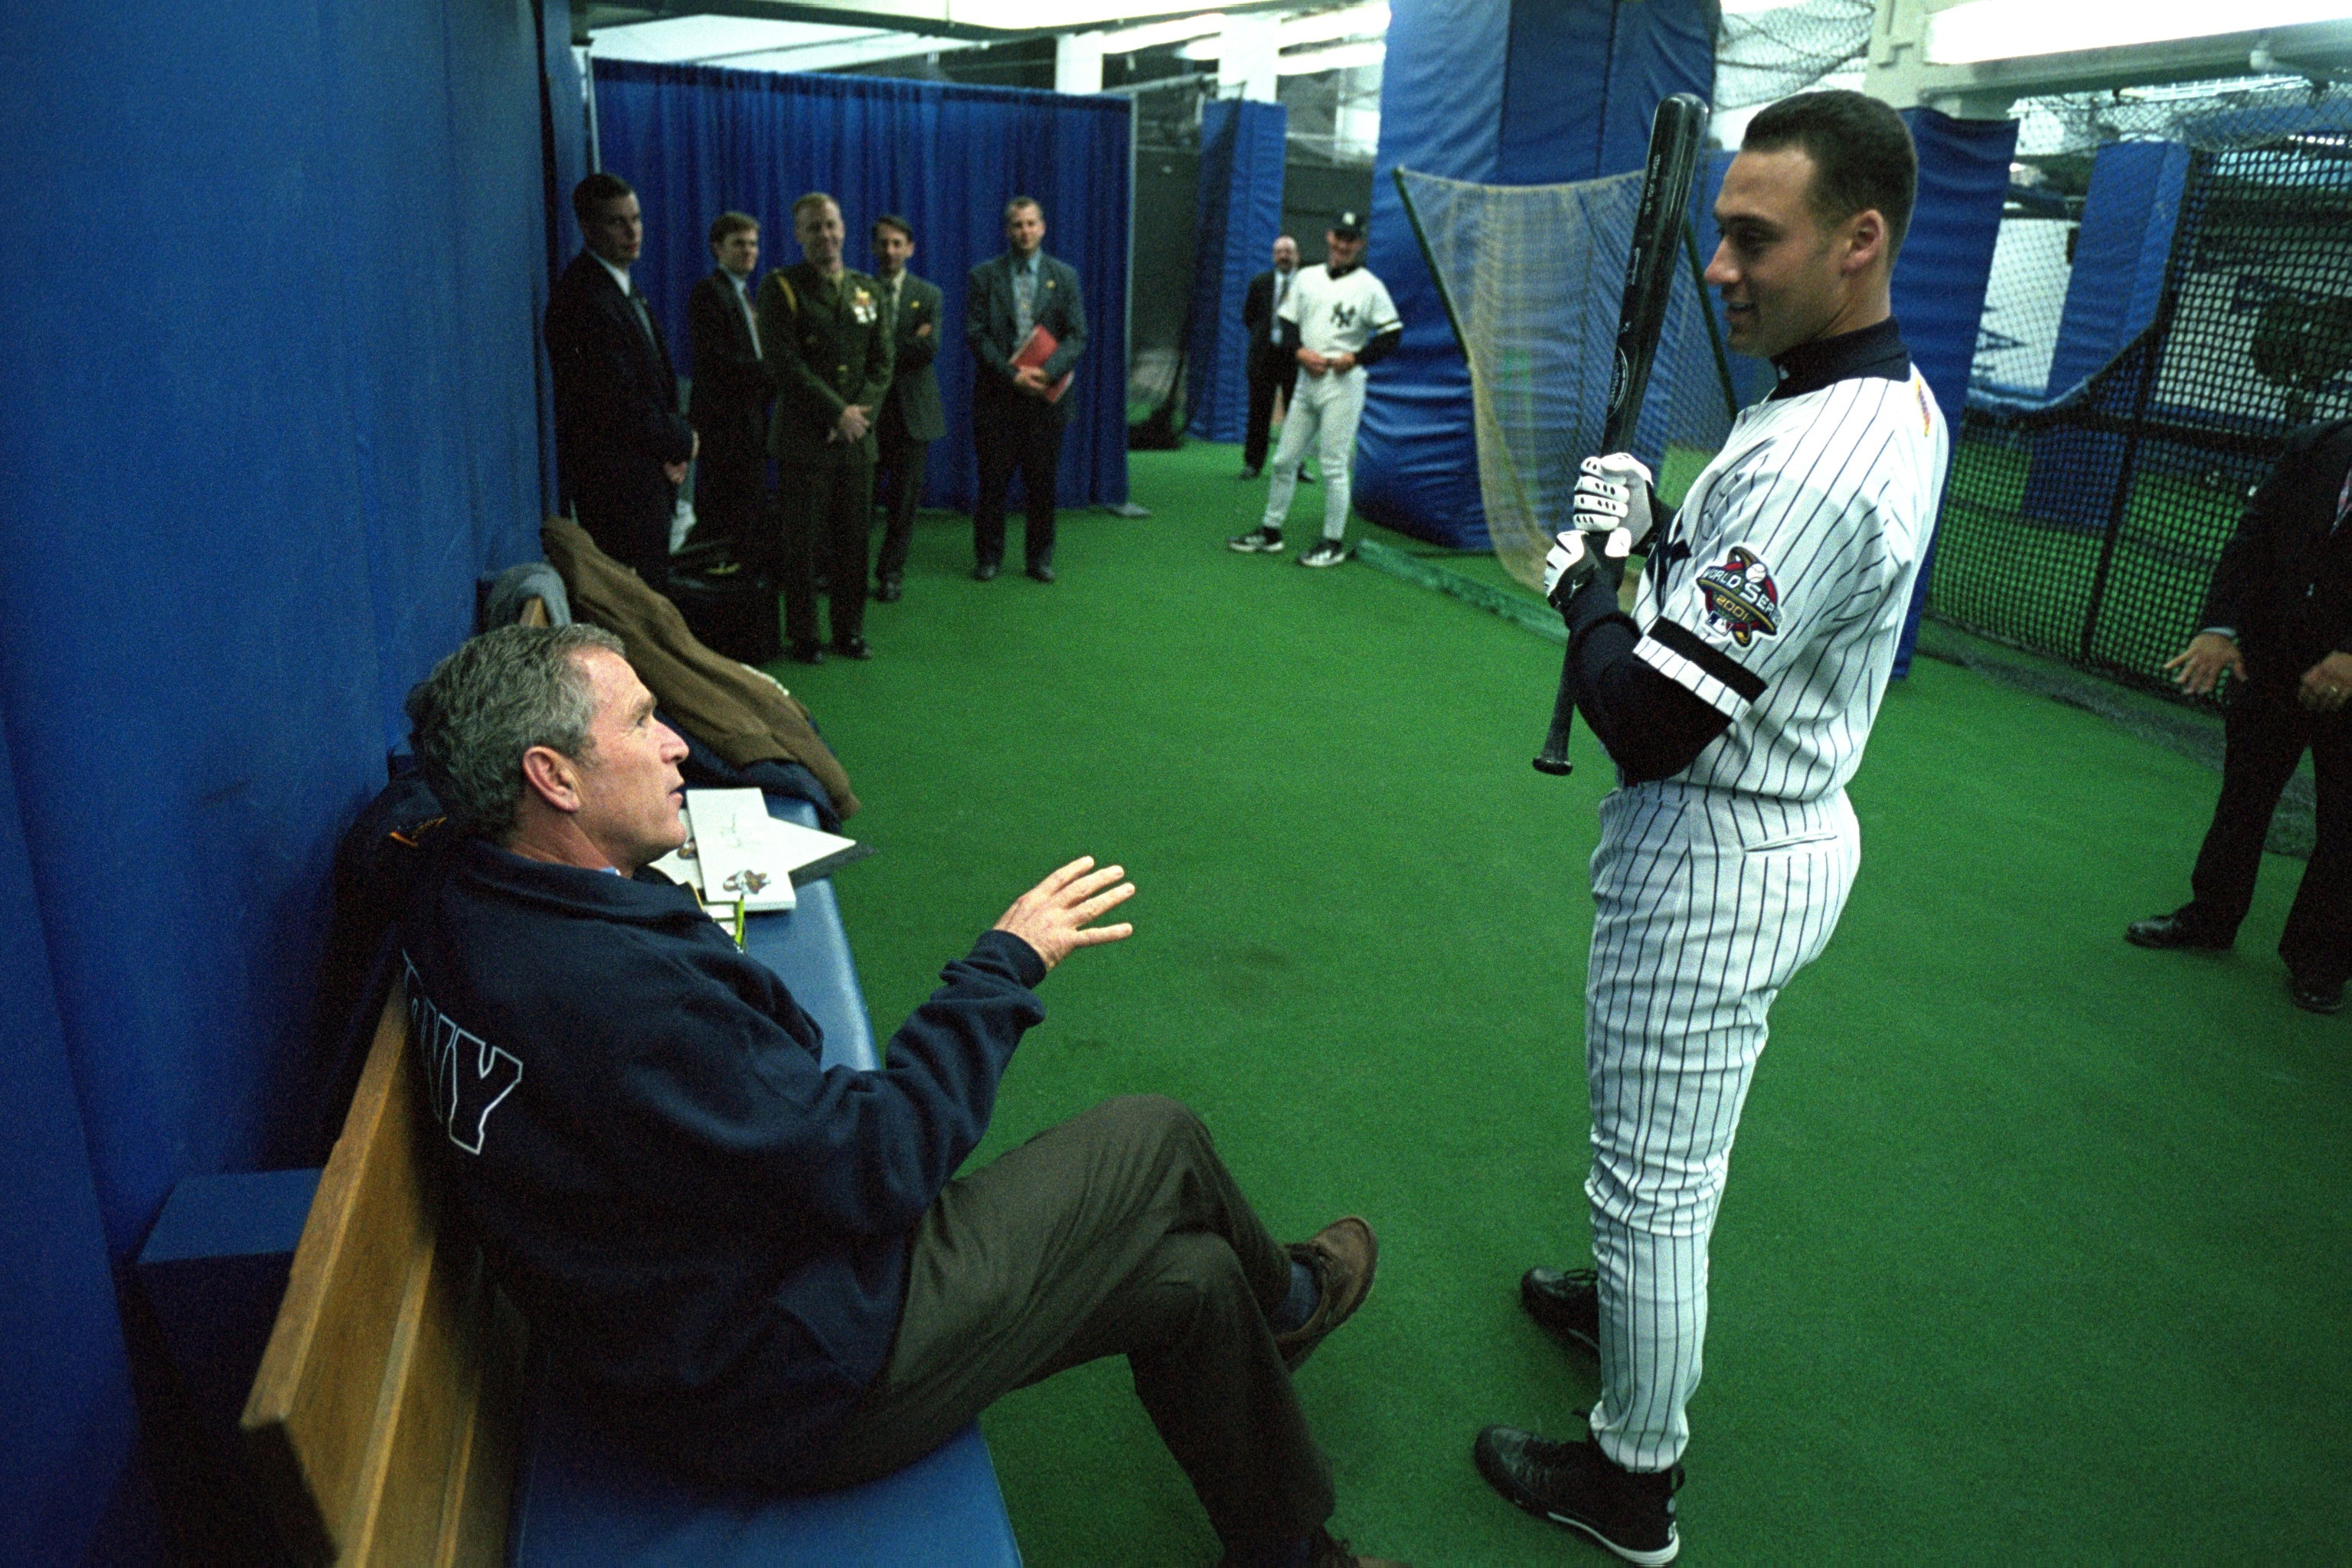 George Bush with Player, American, Bush, George, Player, HQ Photo